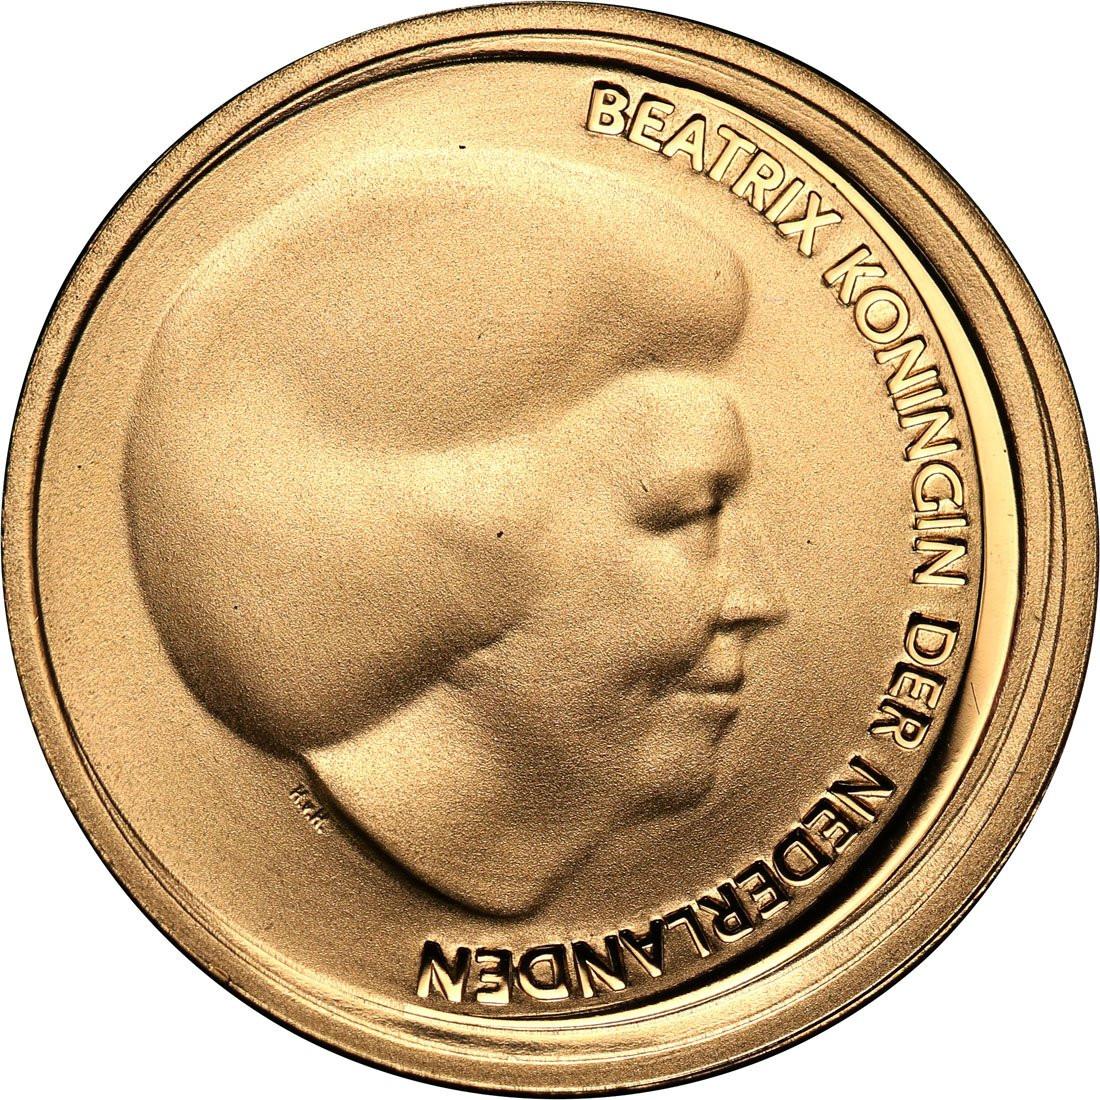 Holandia 10 Euro 2002 Wilhelm + Maxima